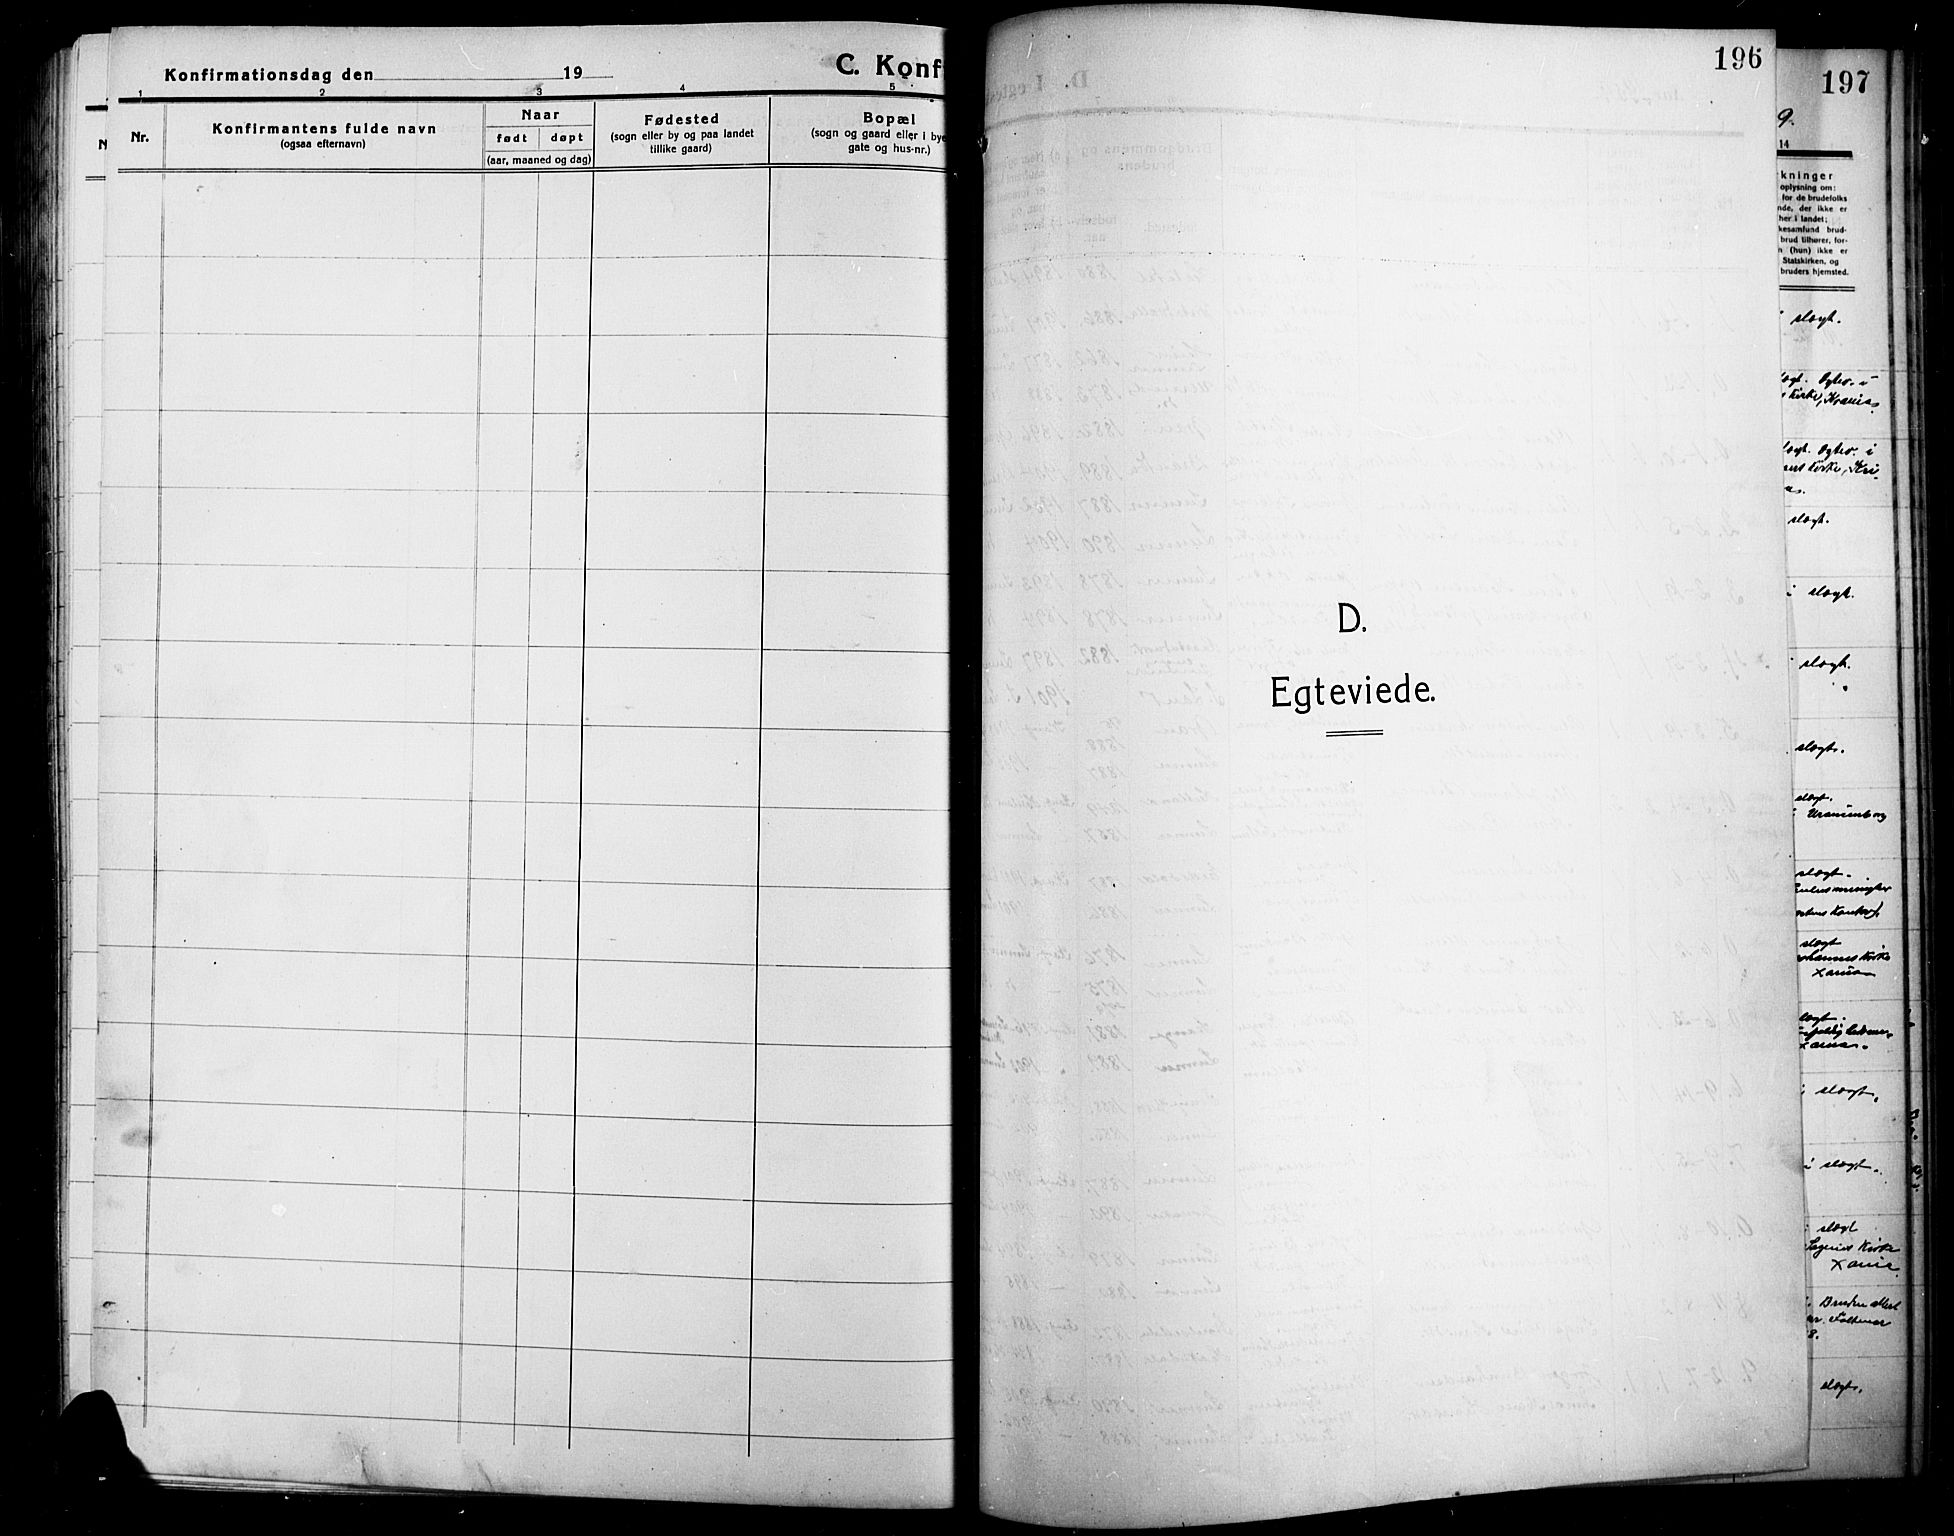 SAH, Lunner prestekontor, H/Ha/Hab/L0001: Klokkerbok nr. 1, 1909-1922, s. 196